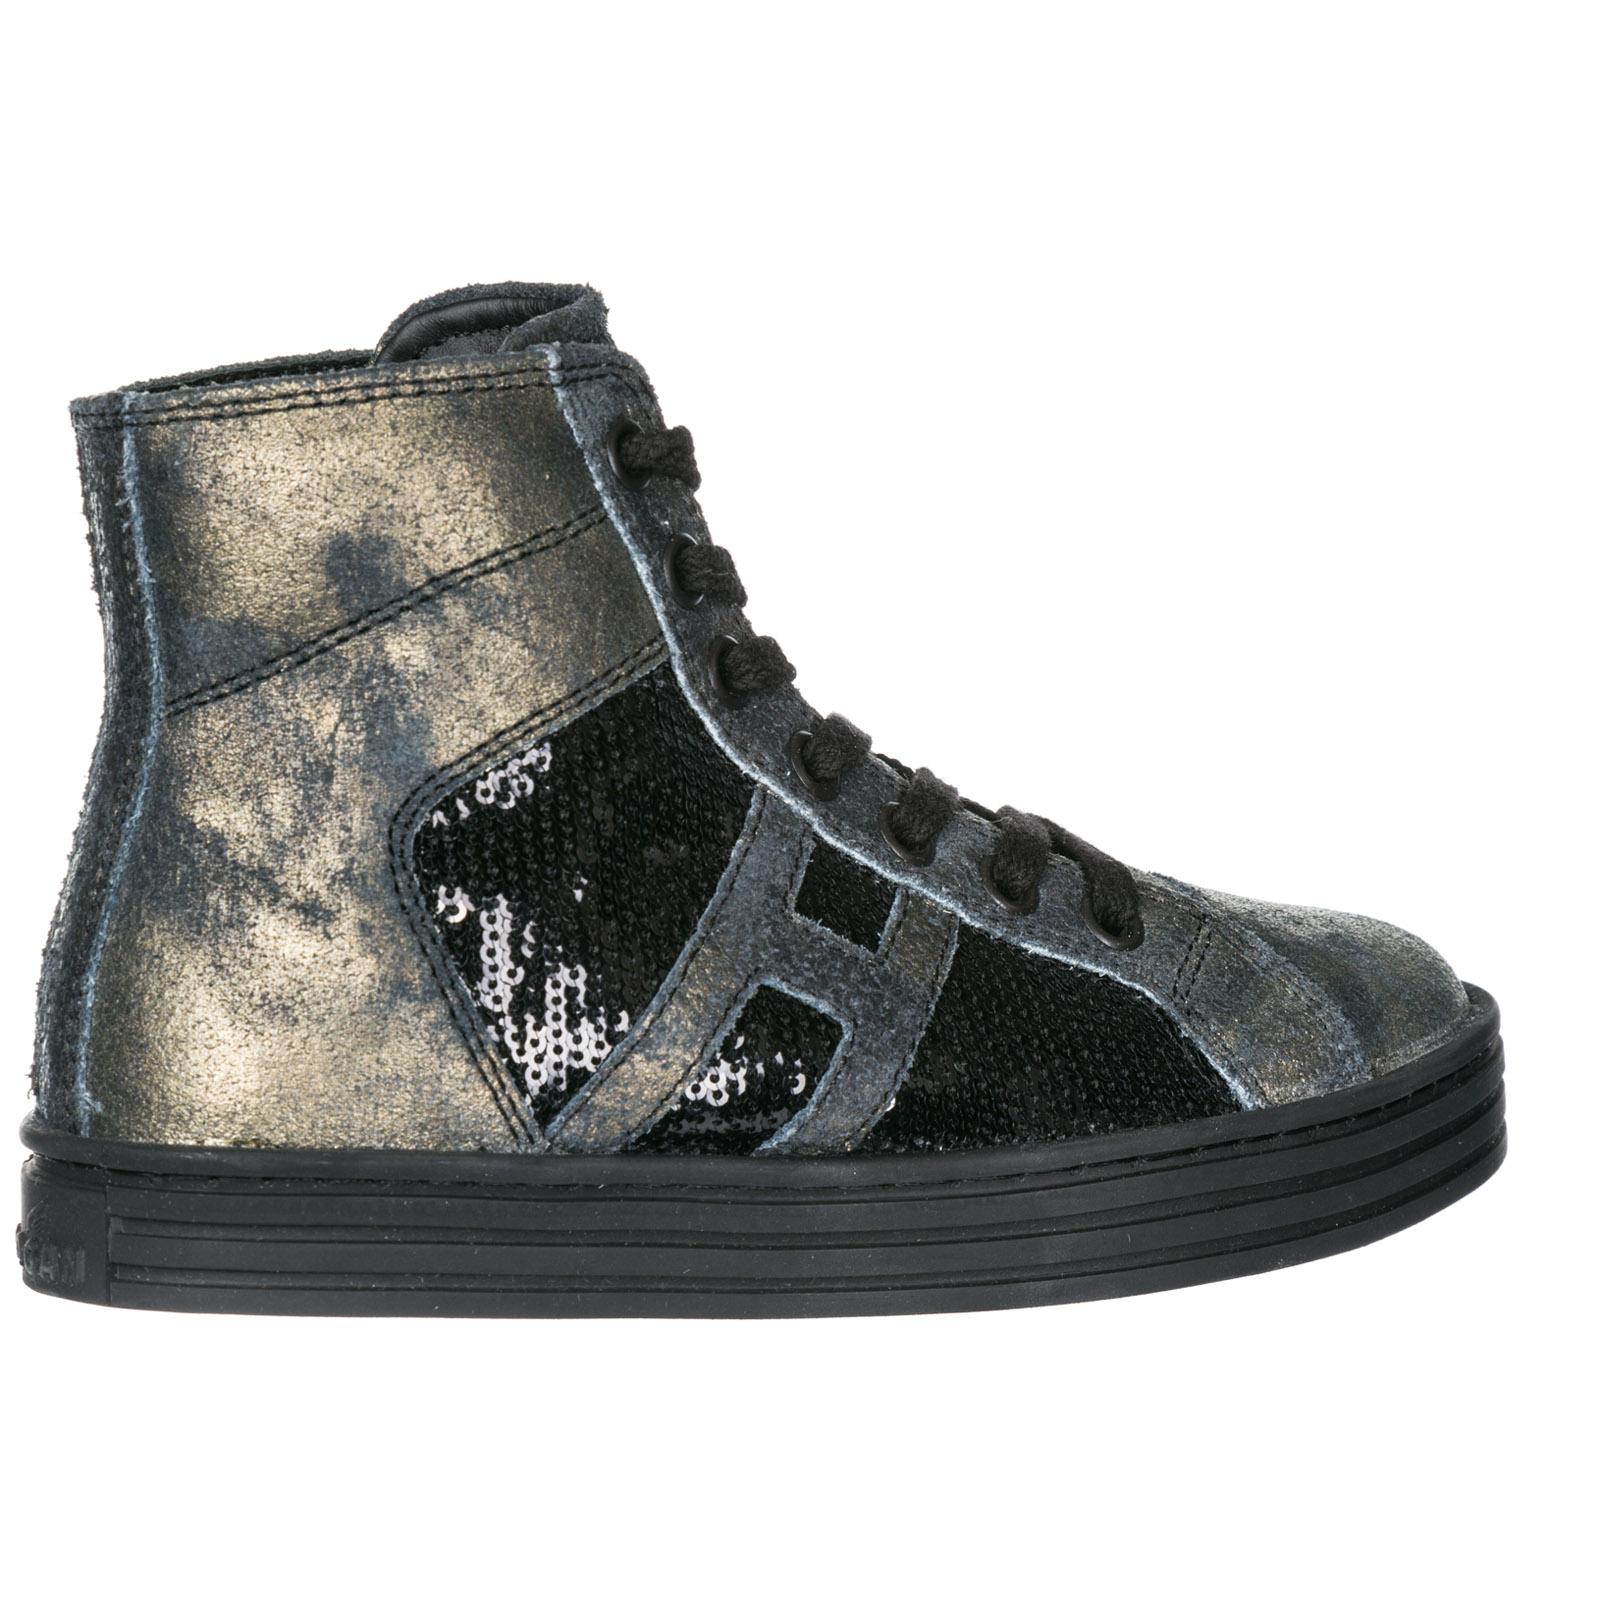 Scarpe sneakers bambina alte pelle r141